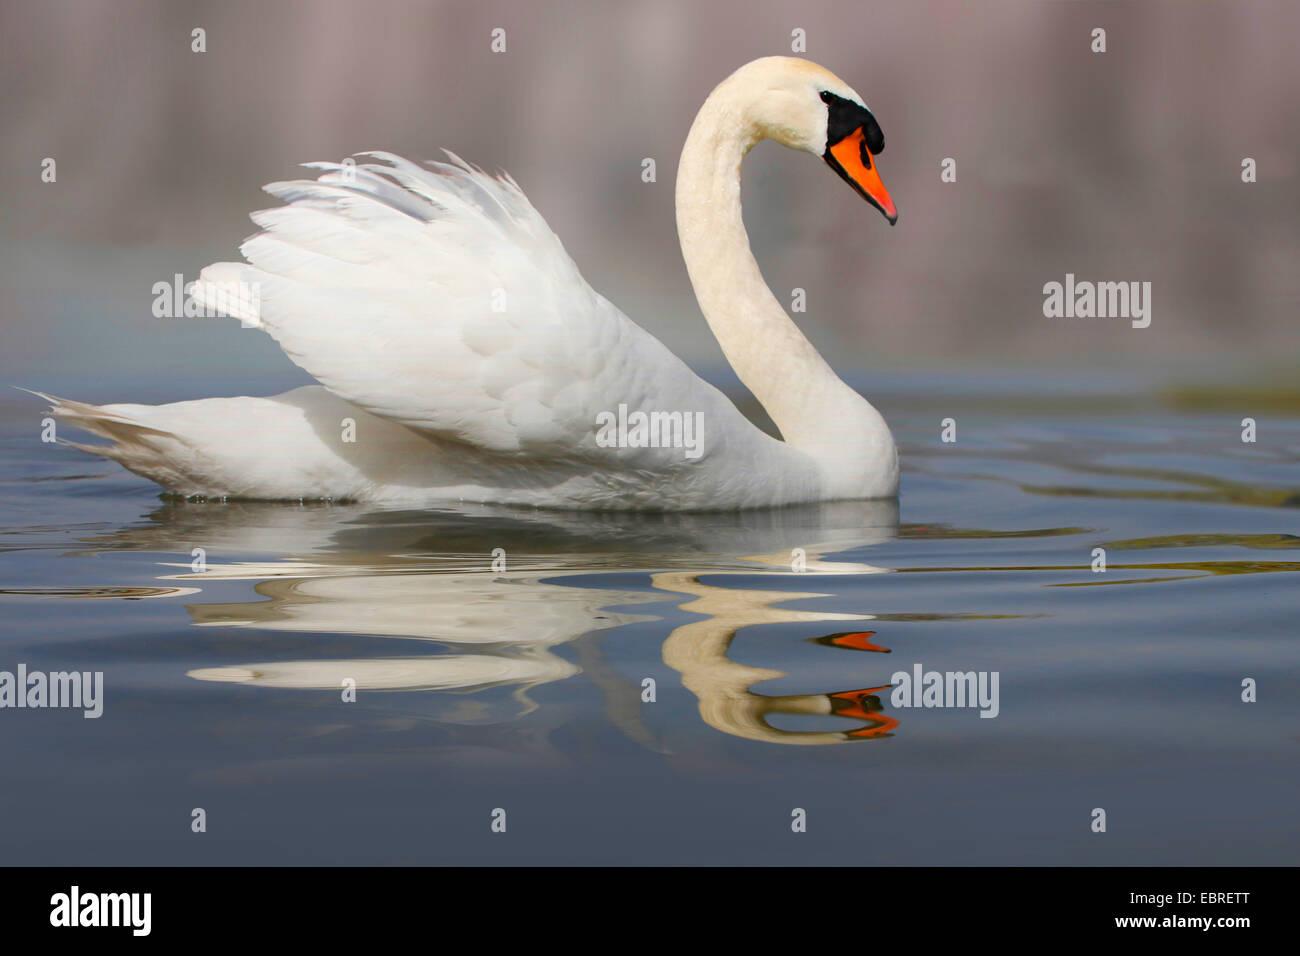 mute swan (Cygnus olor), swimming, Germany - Stock Image